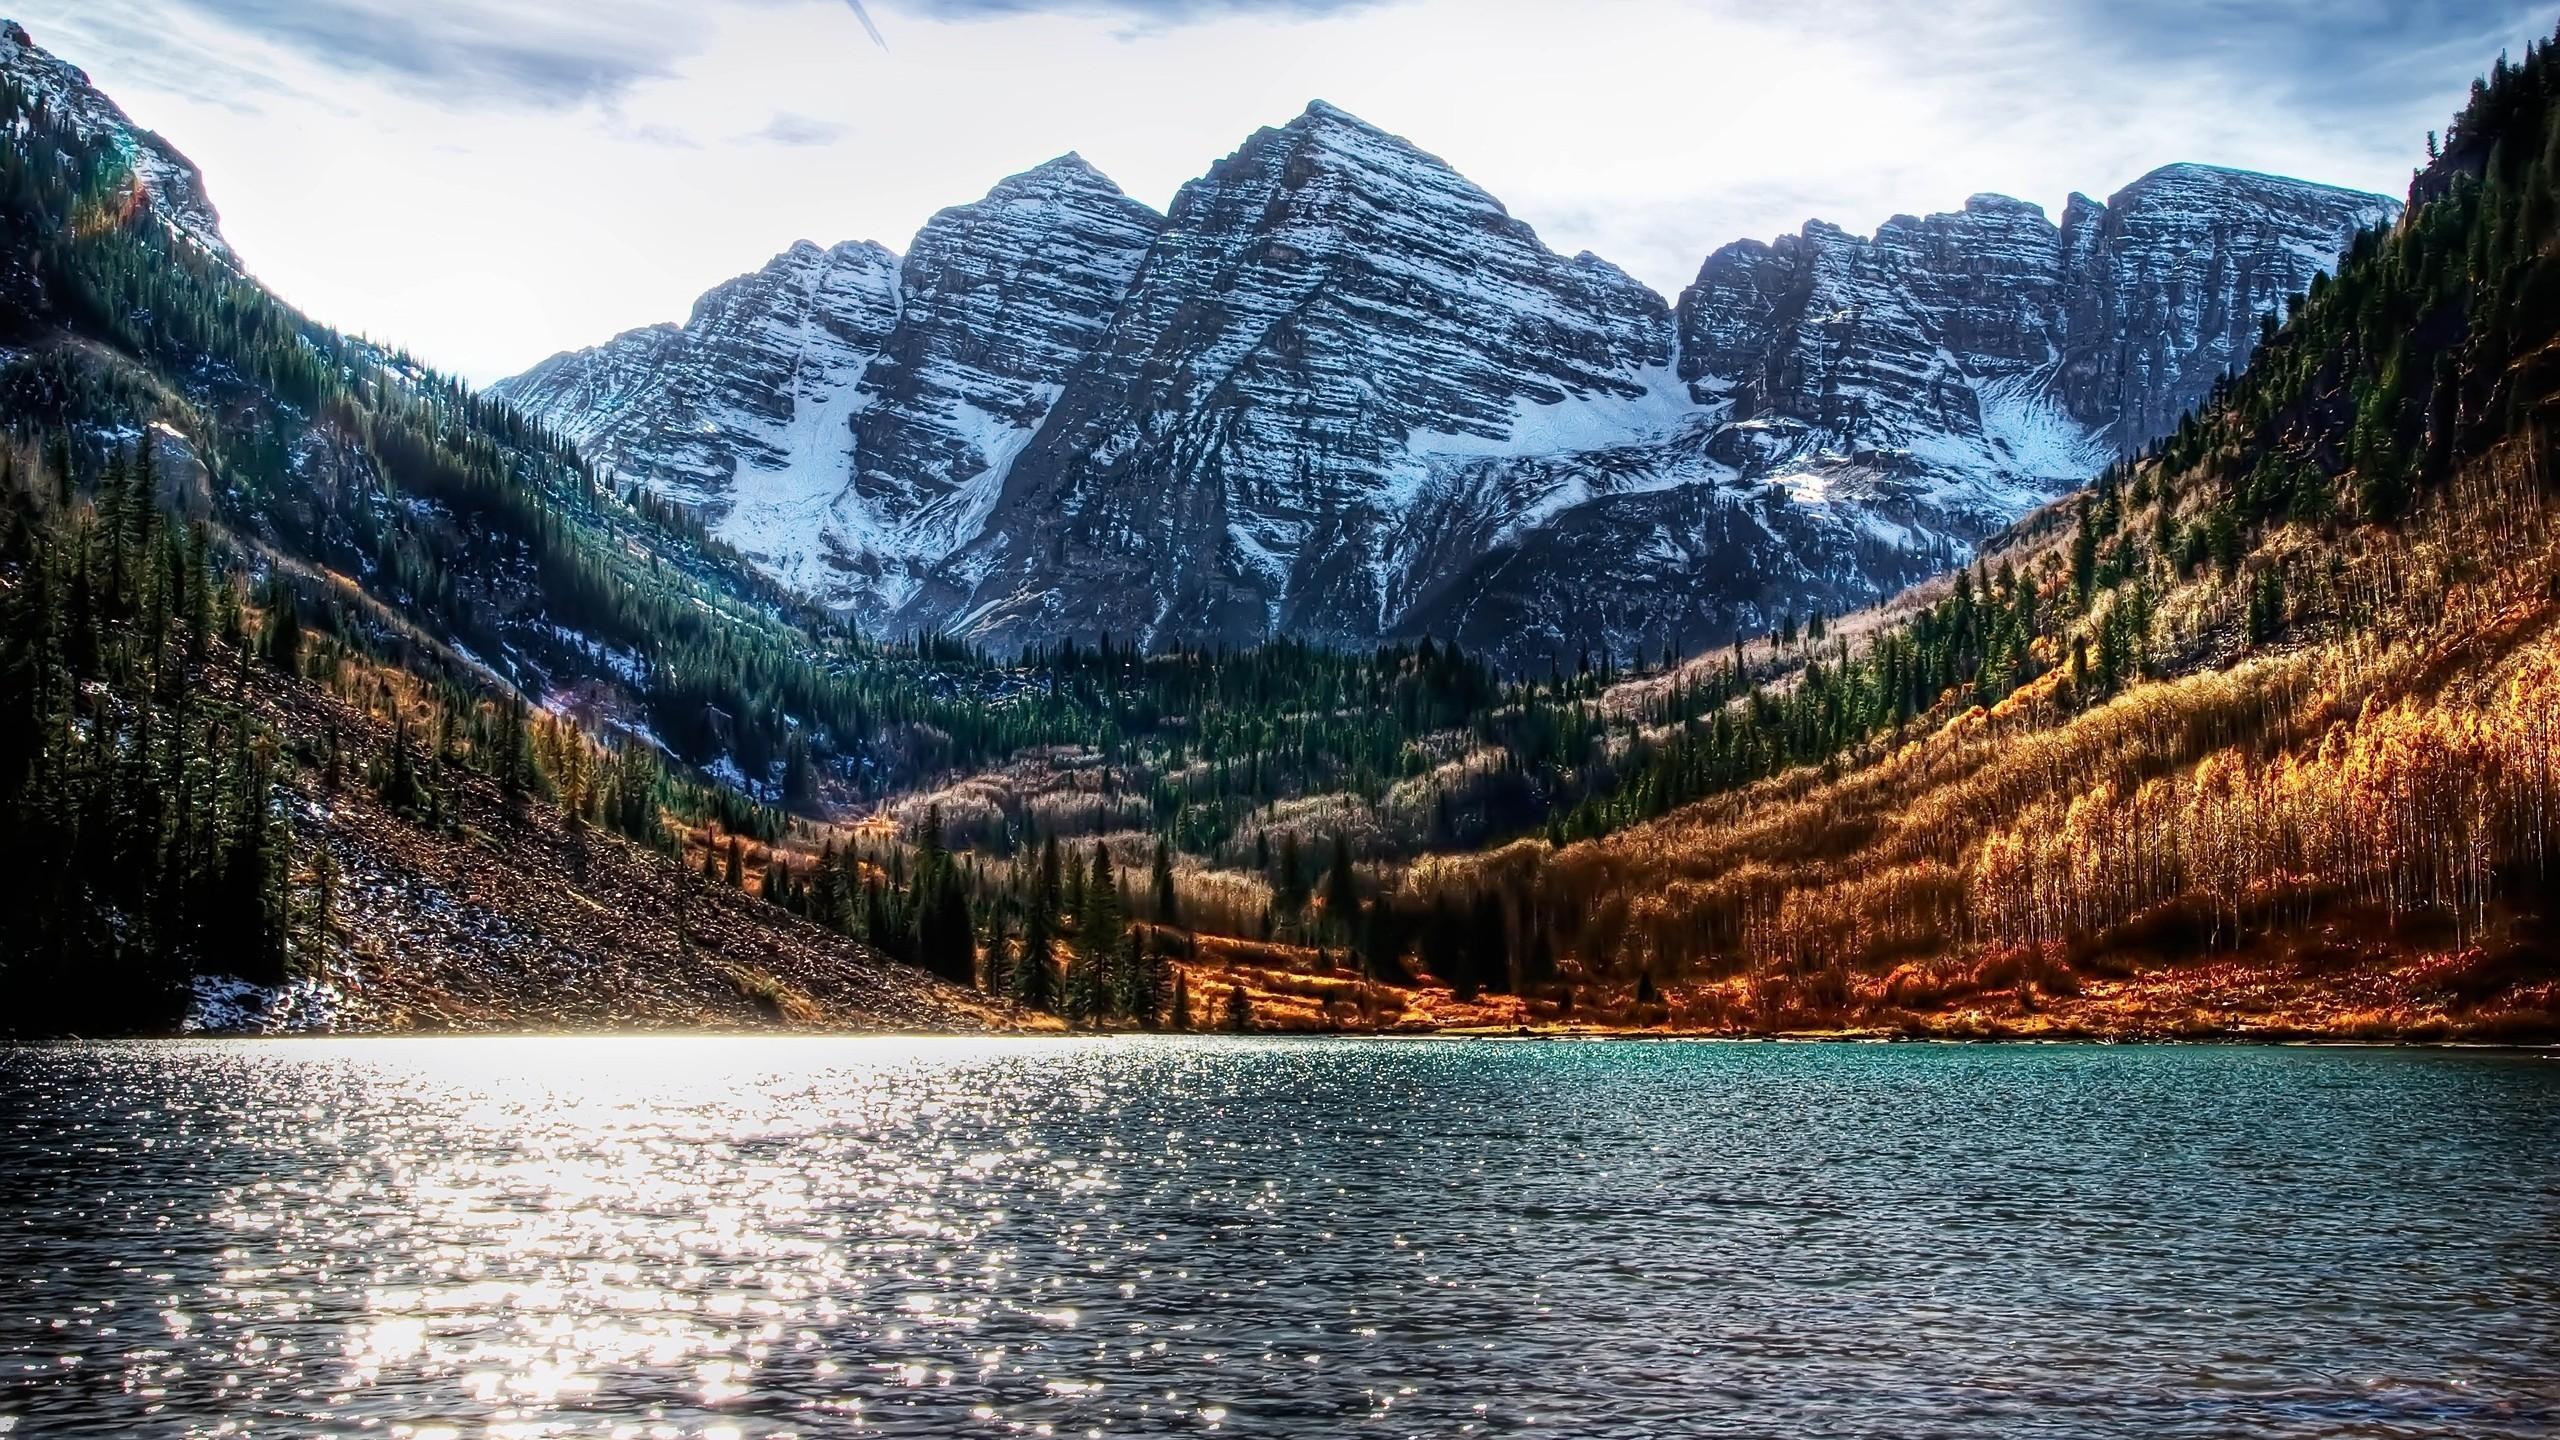 Colorado Mountain Lake. Cool Mount Everest HD Wallpaper